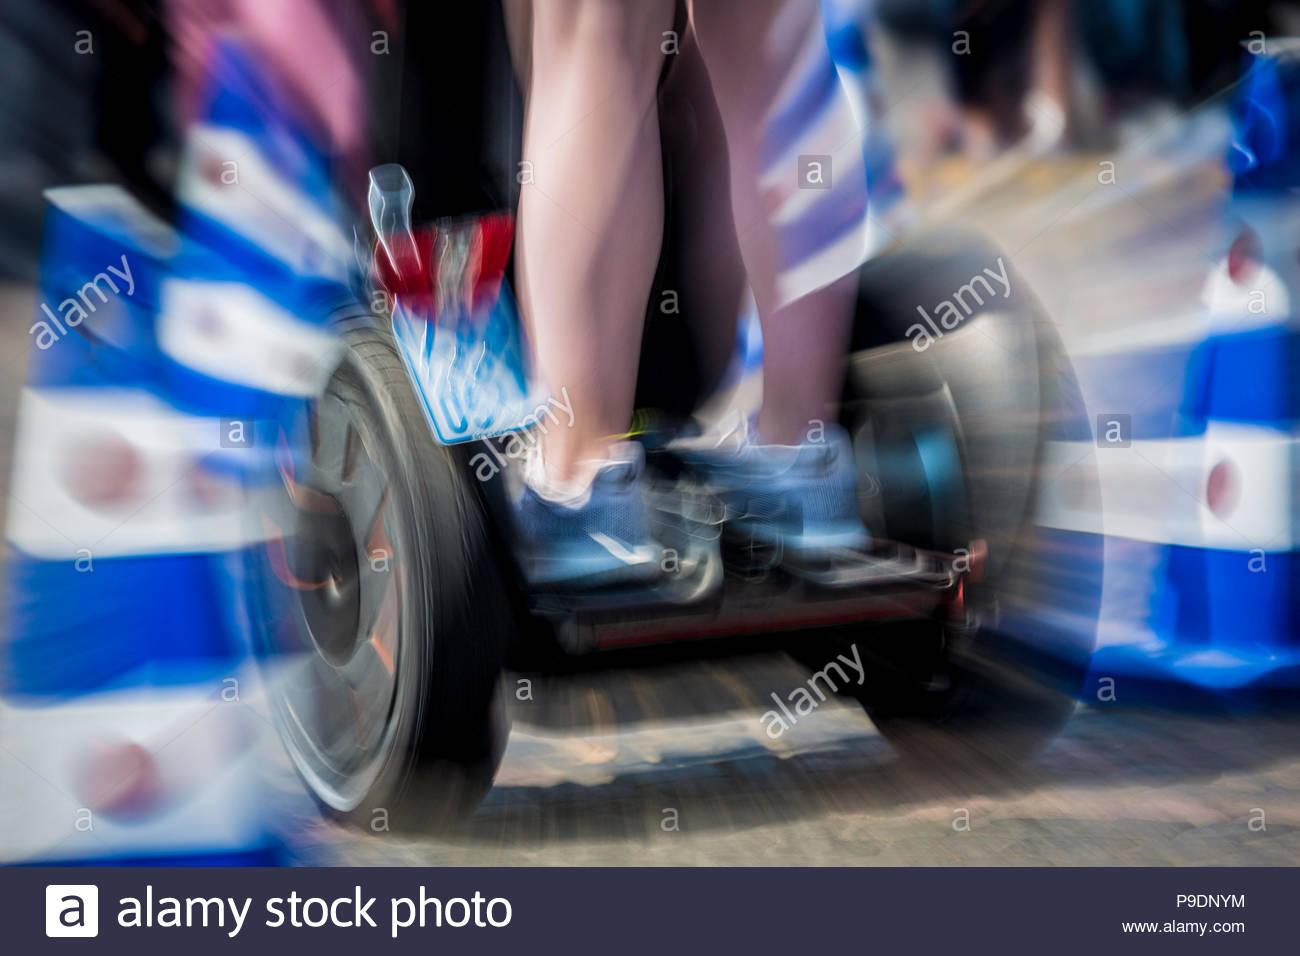 Bonn, DEU, 06.07.2018 Segway-Fahrer in einem Hindernisparcours in Bonn zum Thema Elektromobilitaet-Symbolbild Foto: Bernd Lauter/berndlauter.co Stockbild